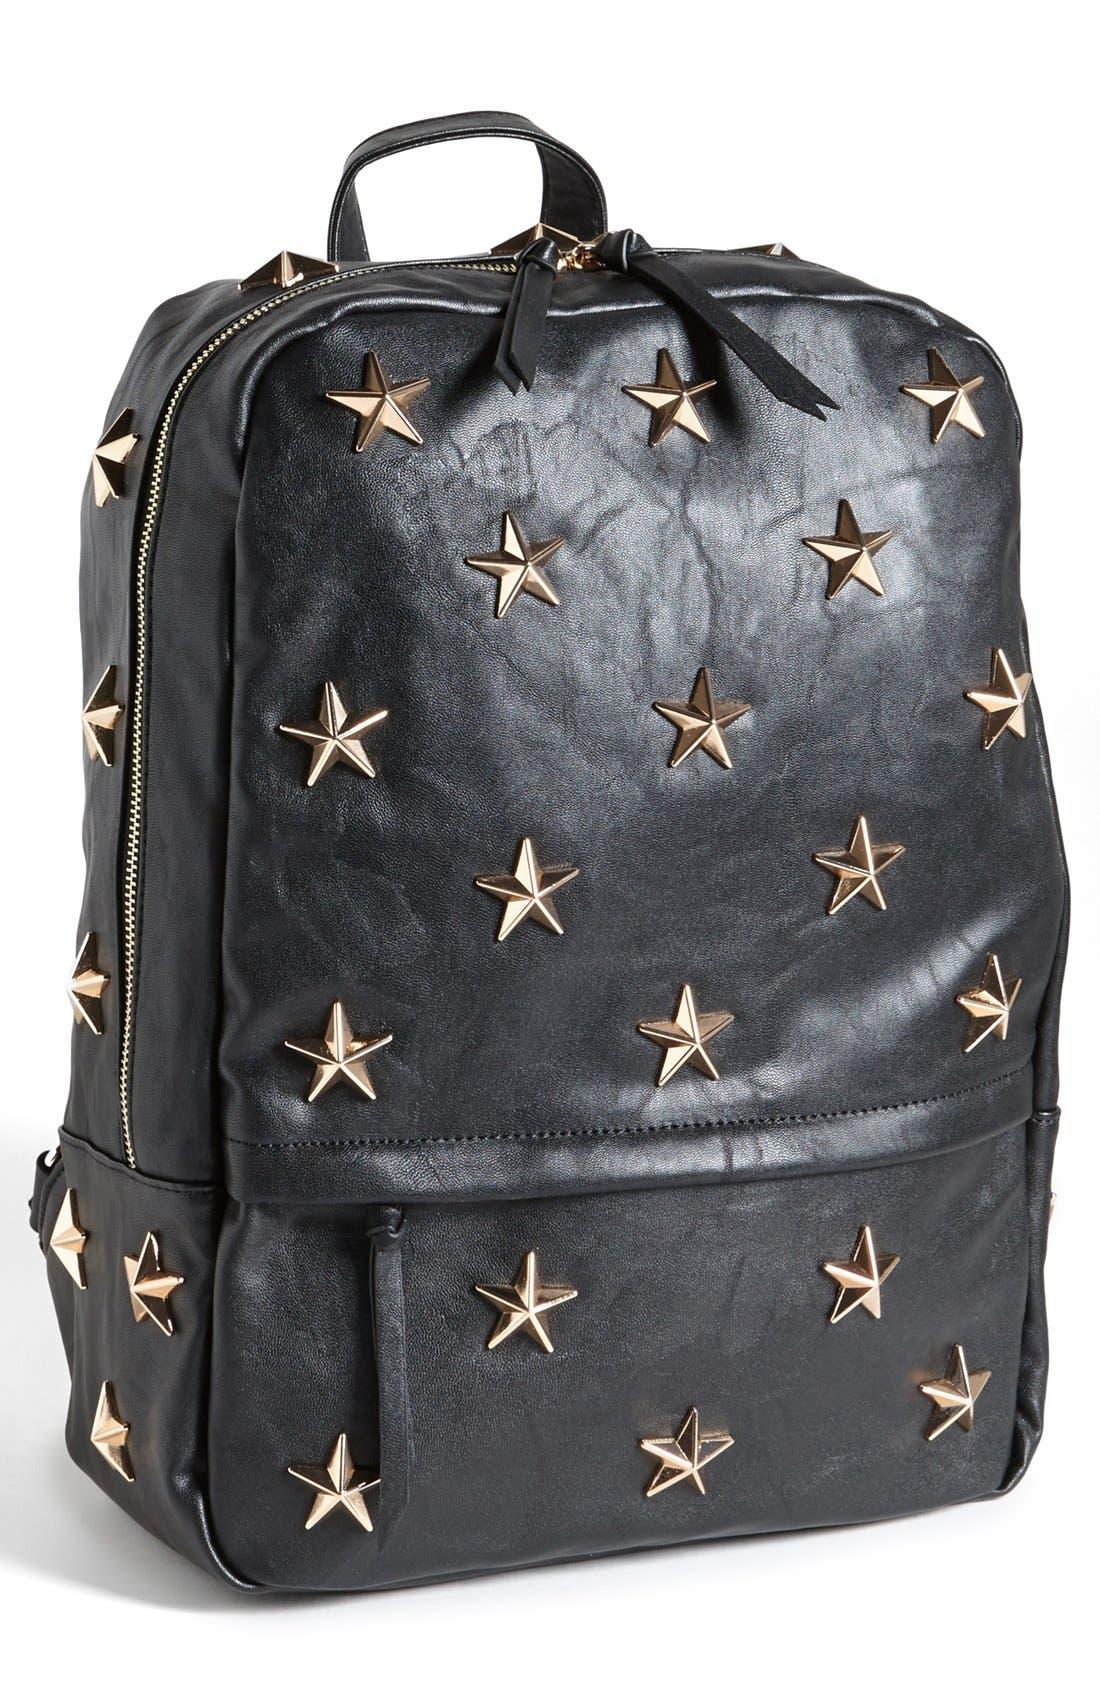 Alternate Image 1 Selected - Nila Anthony 'Star' Stud Backpack